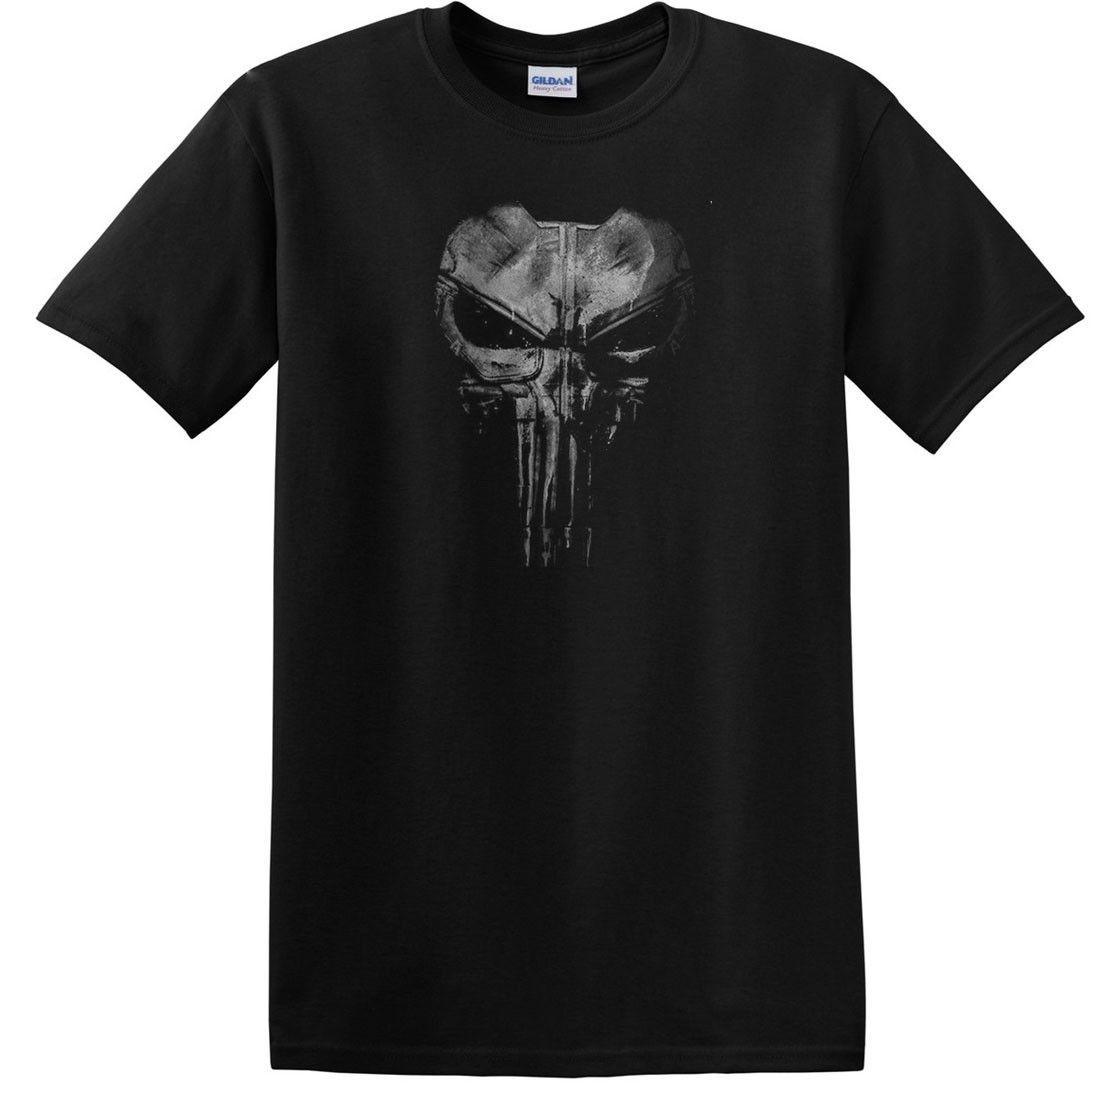 Pigiama Scuro Uomini Temerari The Punisher Cranio Di mywUc